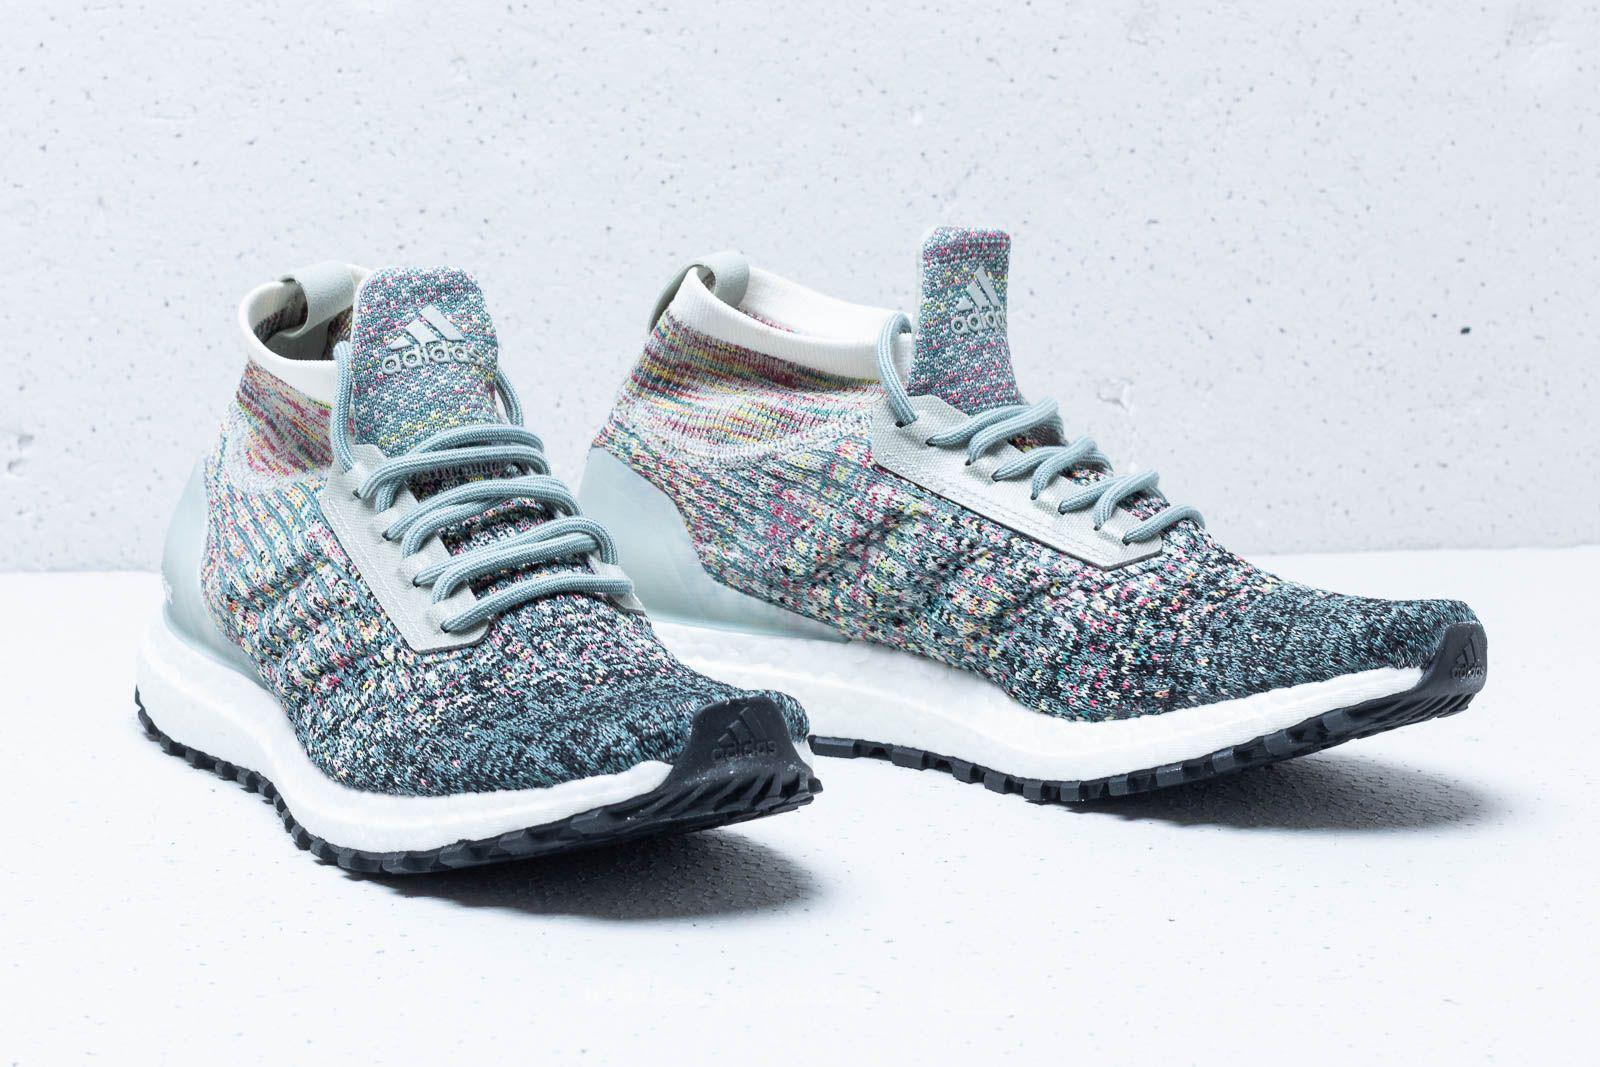 ccf787e121378 Lyst - Footshop Adidas Ultraboost All Terrain Ltd Ash Silver  Carbon ...